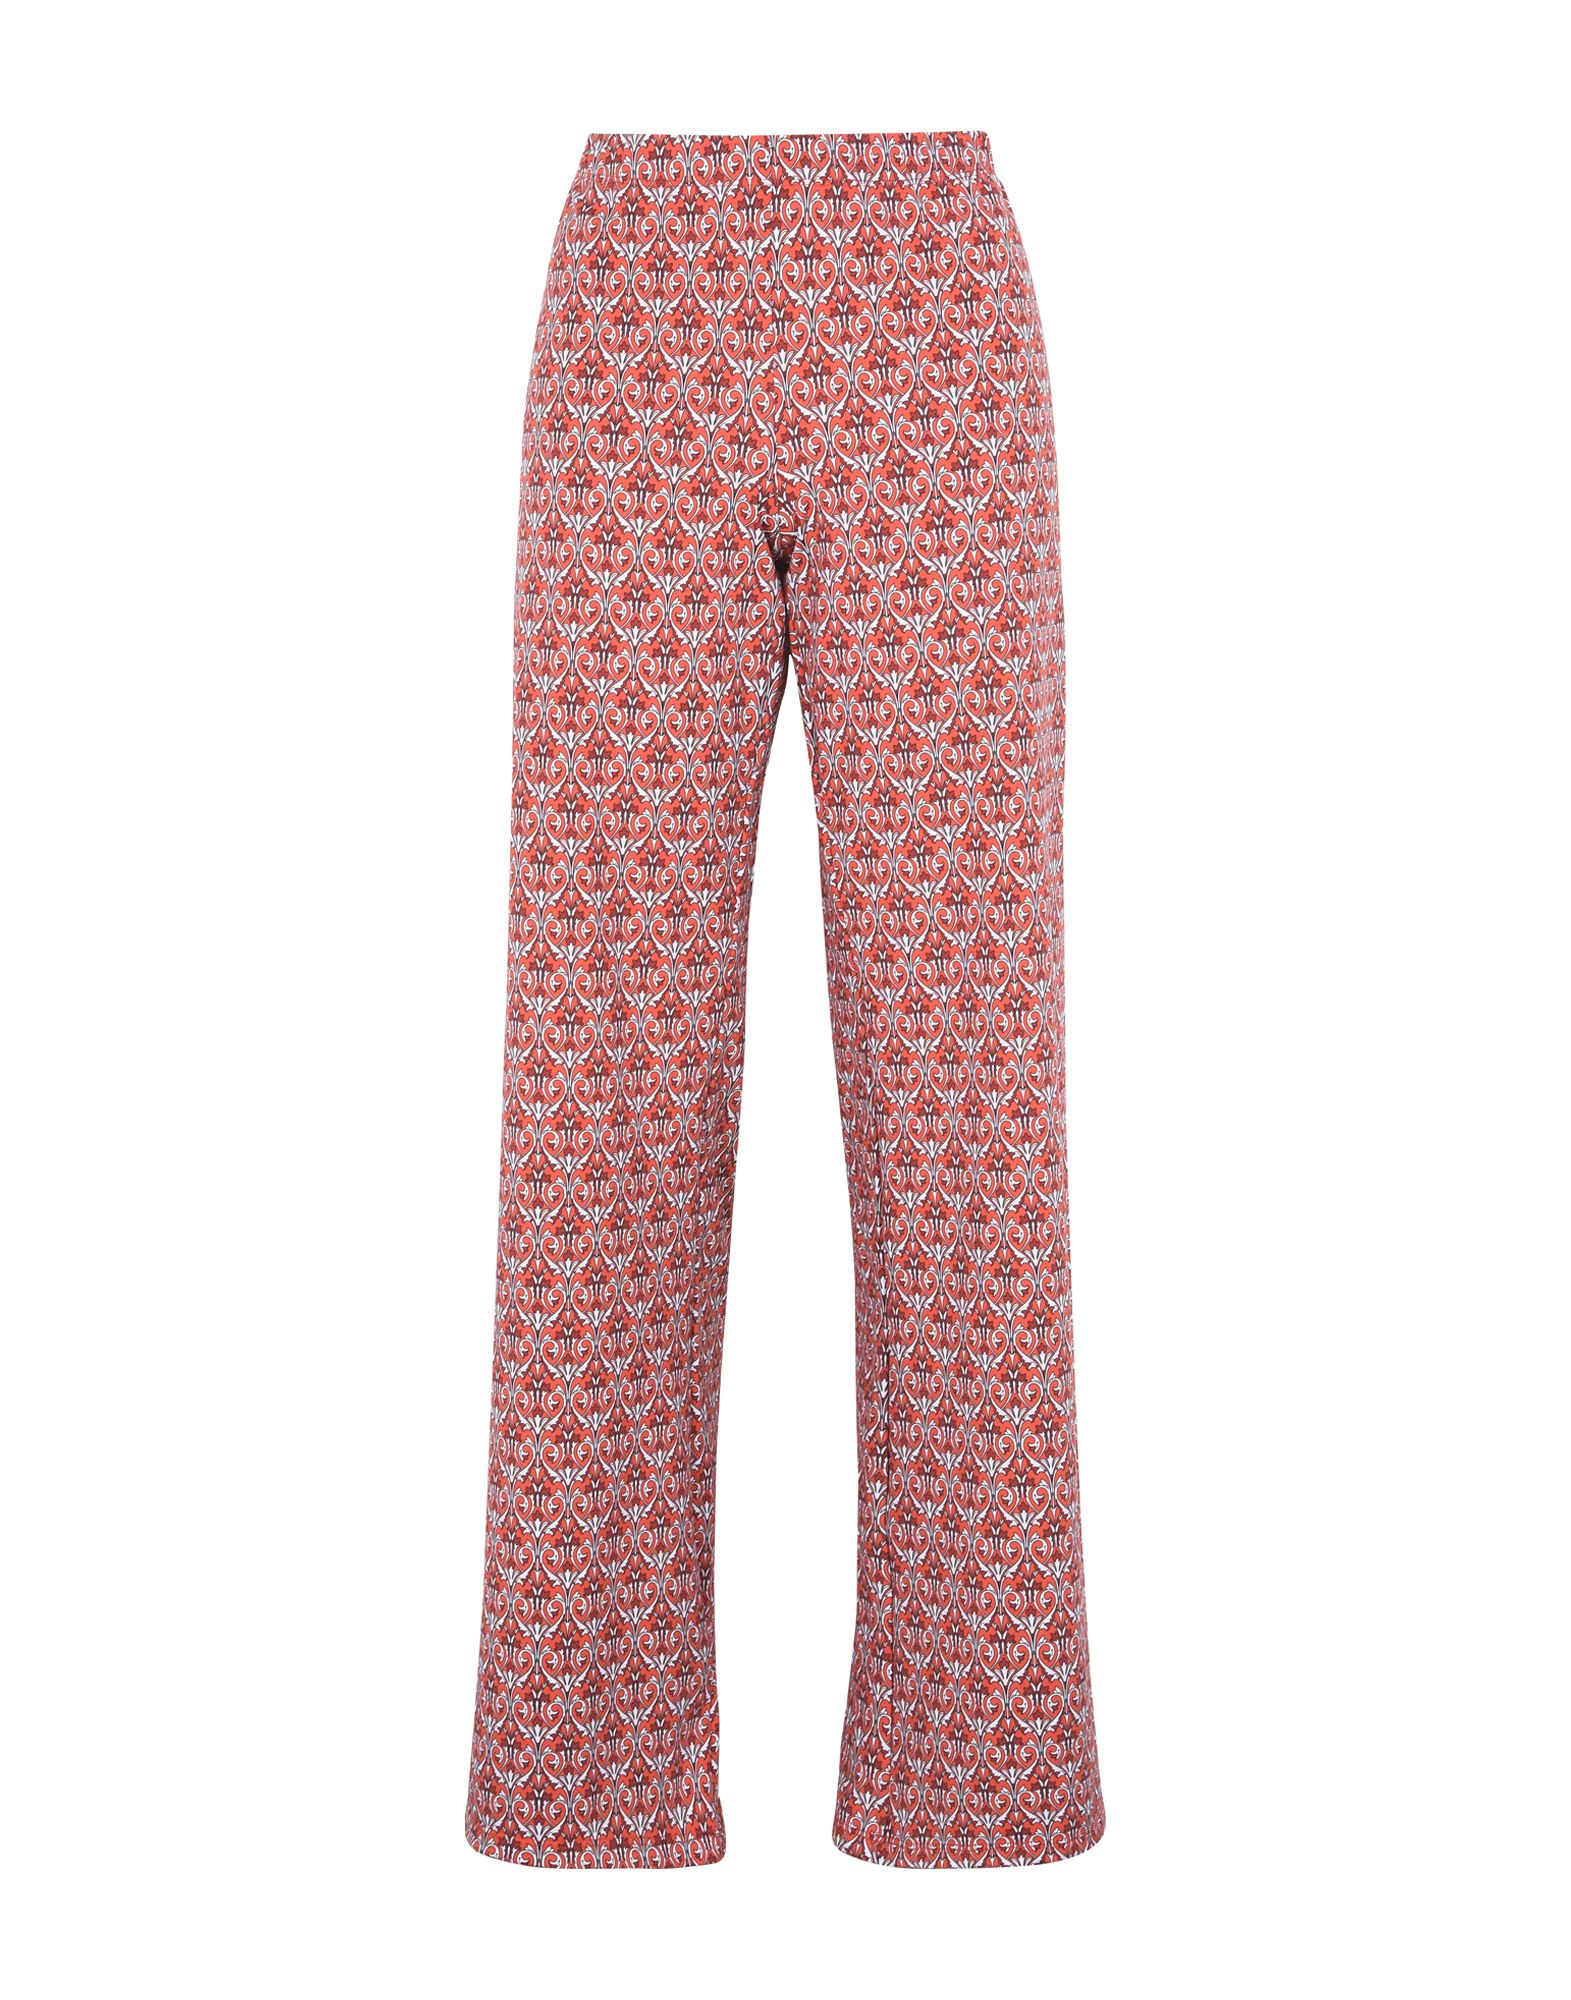 REPAINTED Пляжные брюки и шорты мужские пляжные шорты menstore surf s001